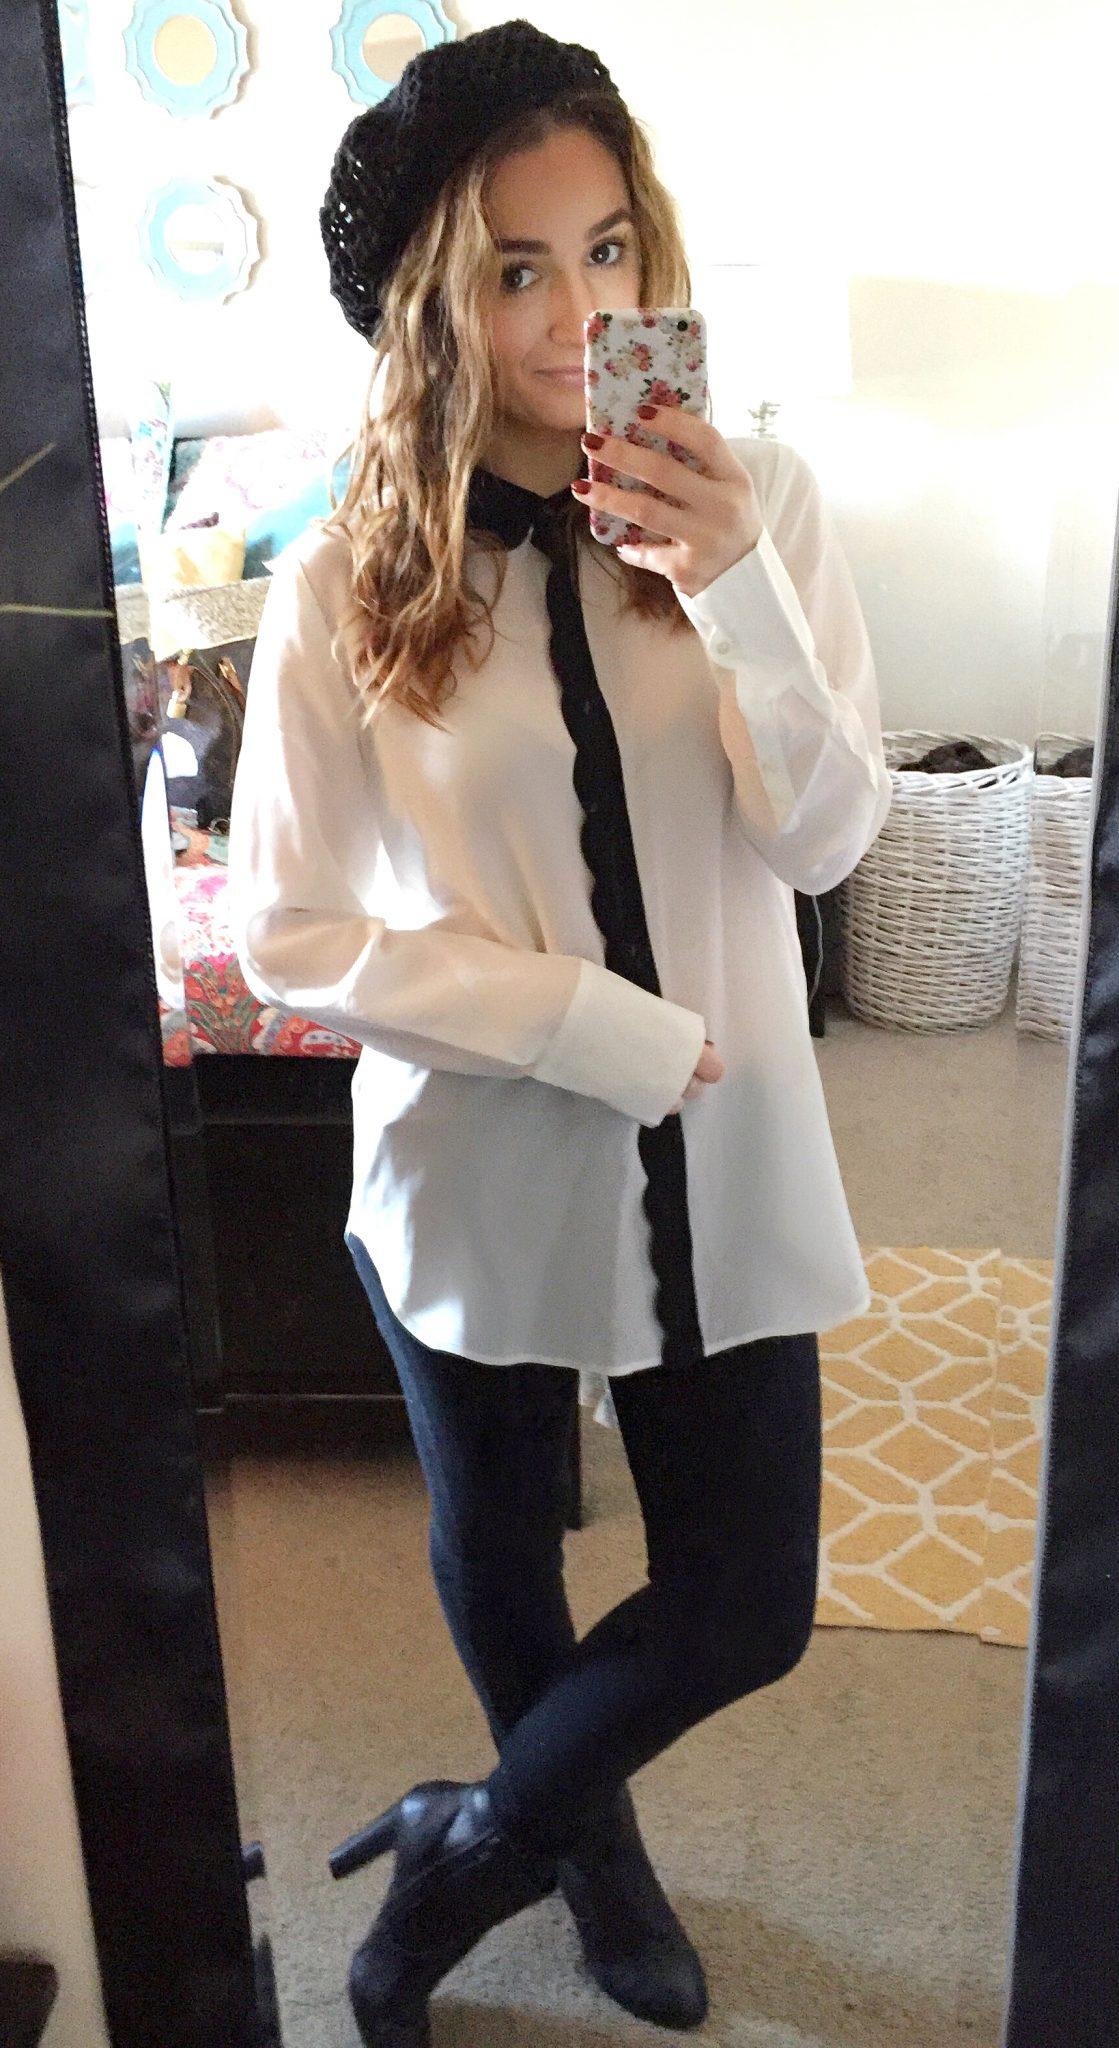 I let my boyfriend dress me - monday